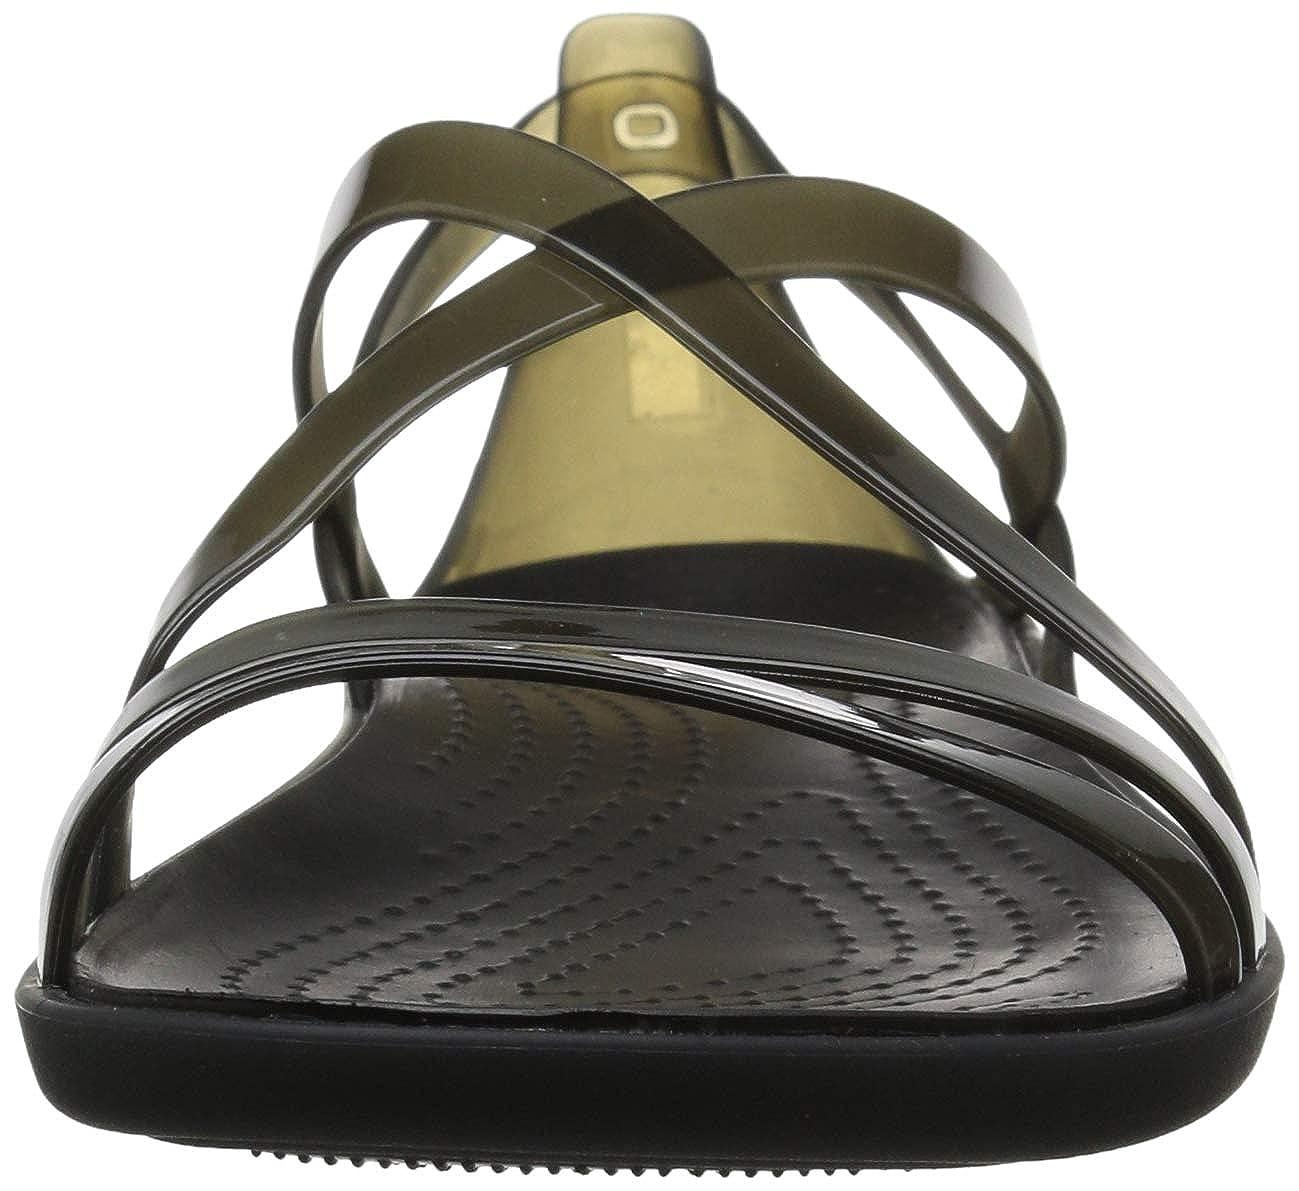 b1bdf84f6ab5 Amazon.com  Crocs Women s Isabella Strappy Sandal  Shoes